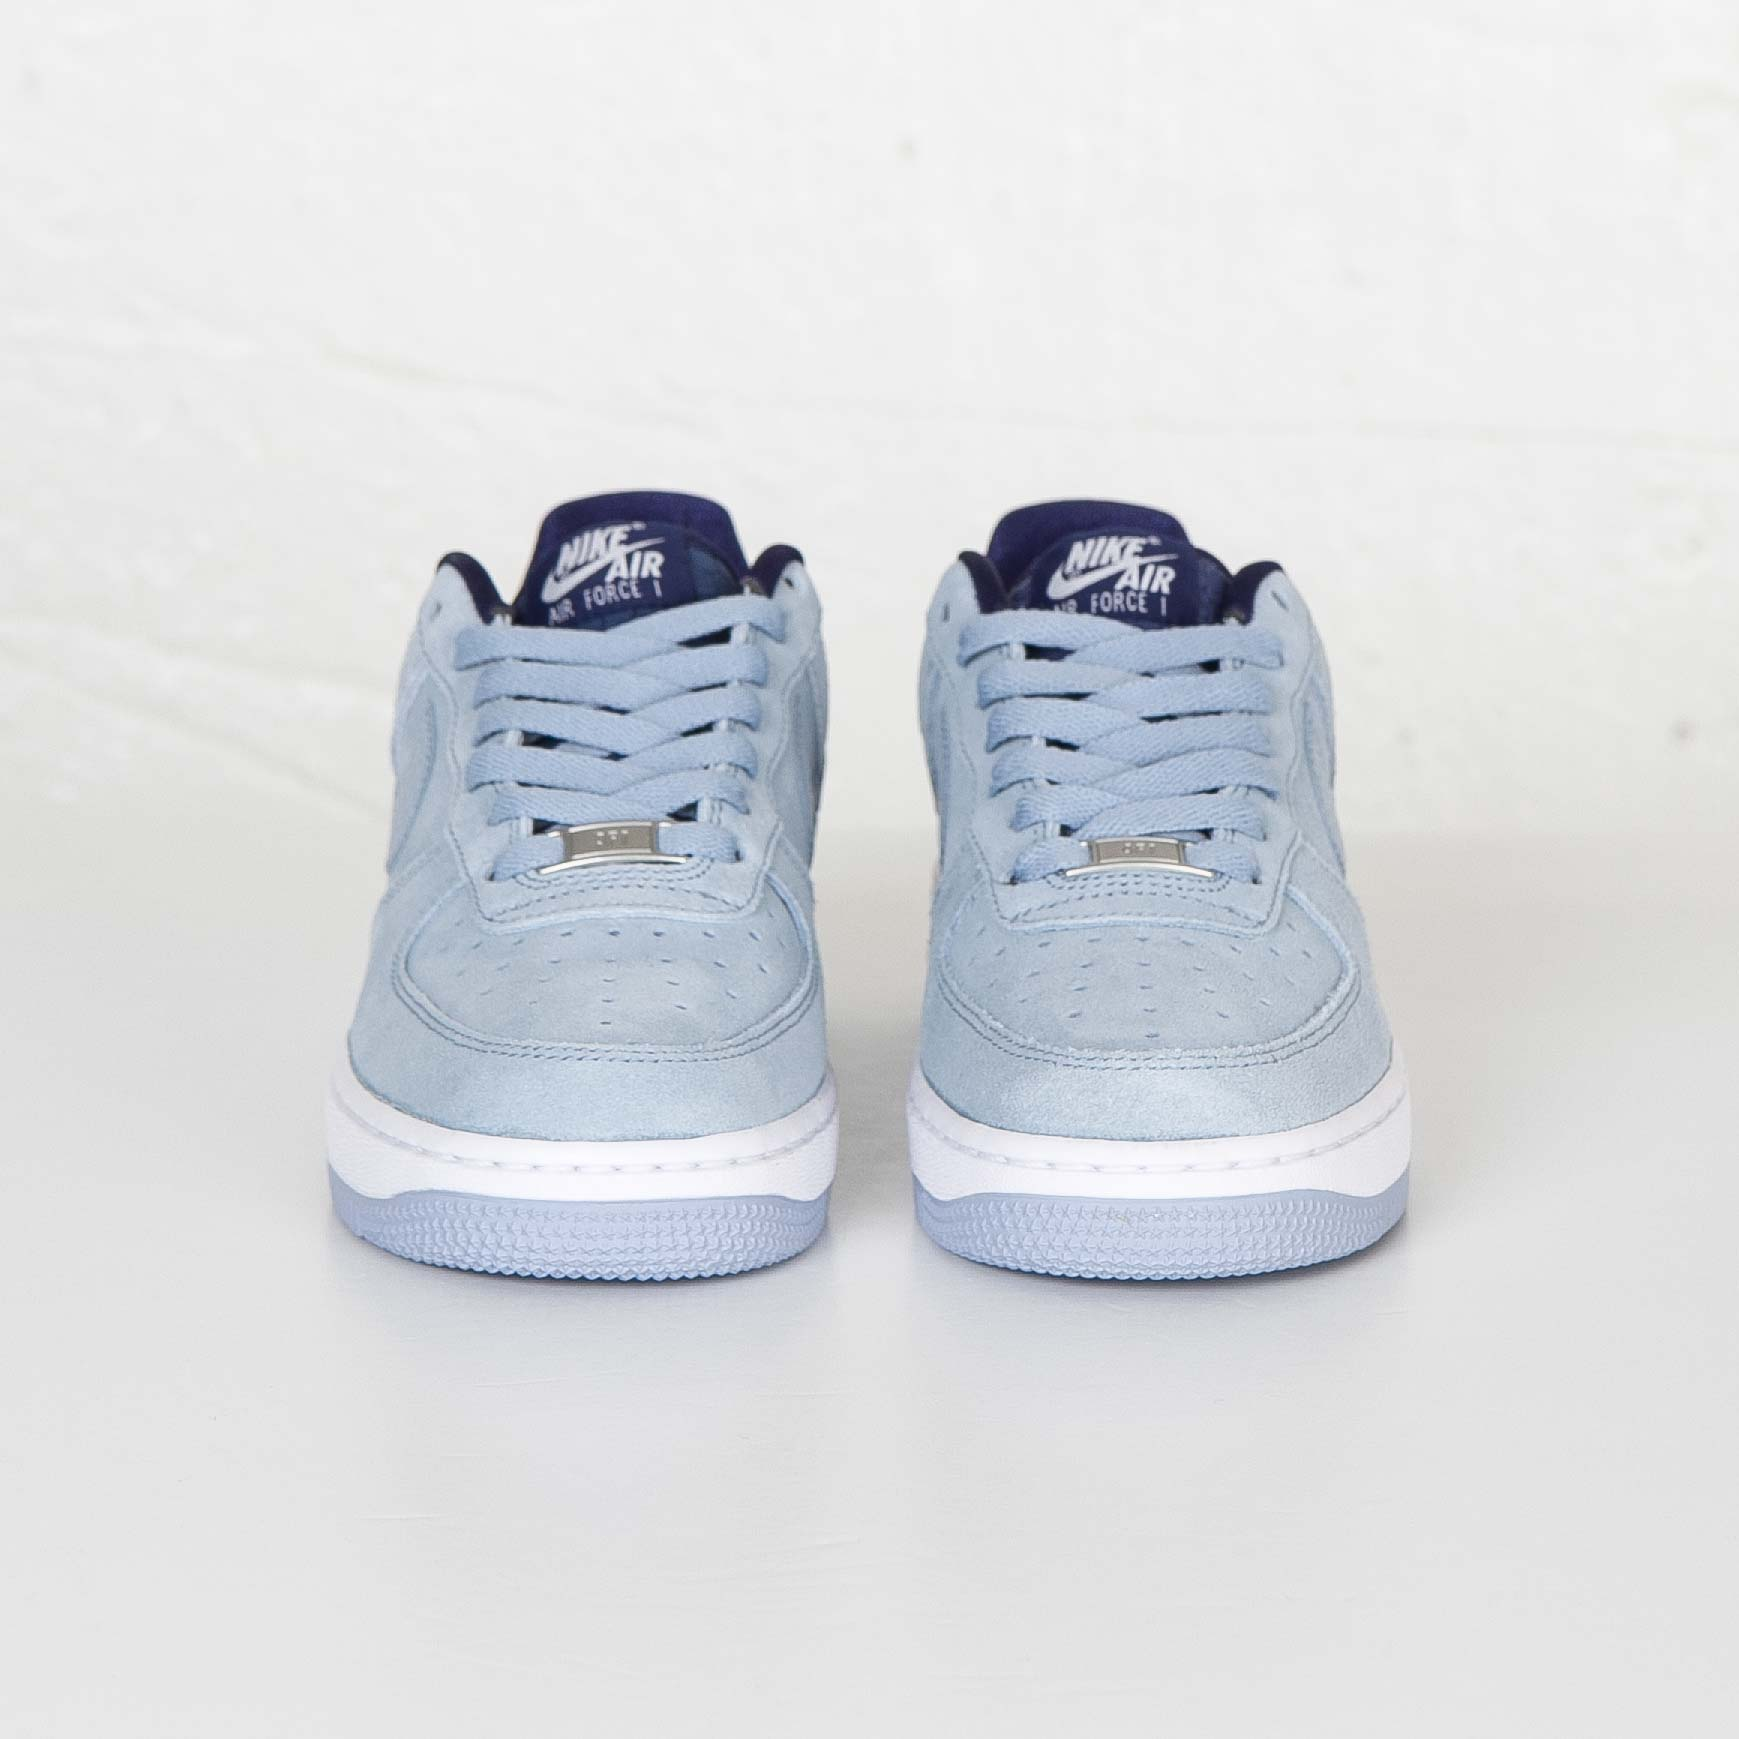 Favor Literatura Vago  Nike W Air Force 1 07 Seasonal - 818594-400 - Sneakersnstuff ...